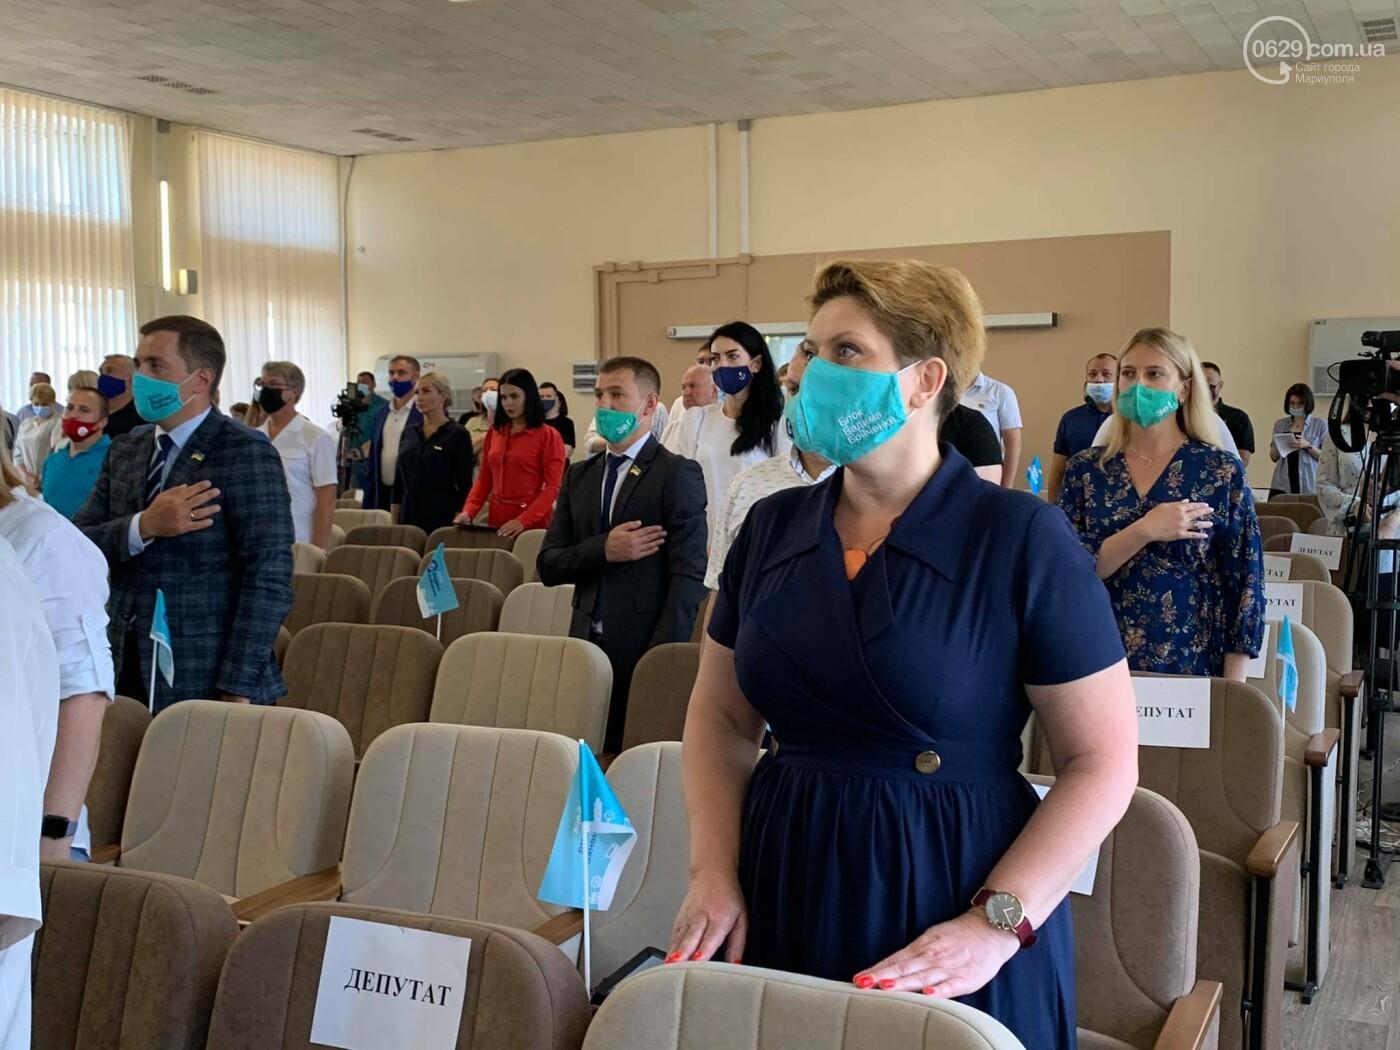 В Мариуполе стартовала сессия горсовета, - ФОТО, фото-6